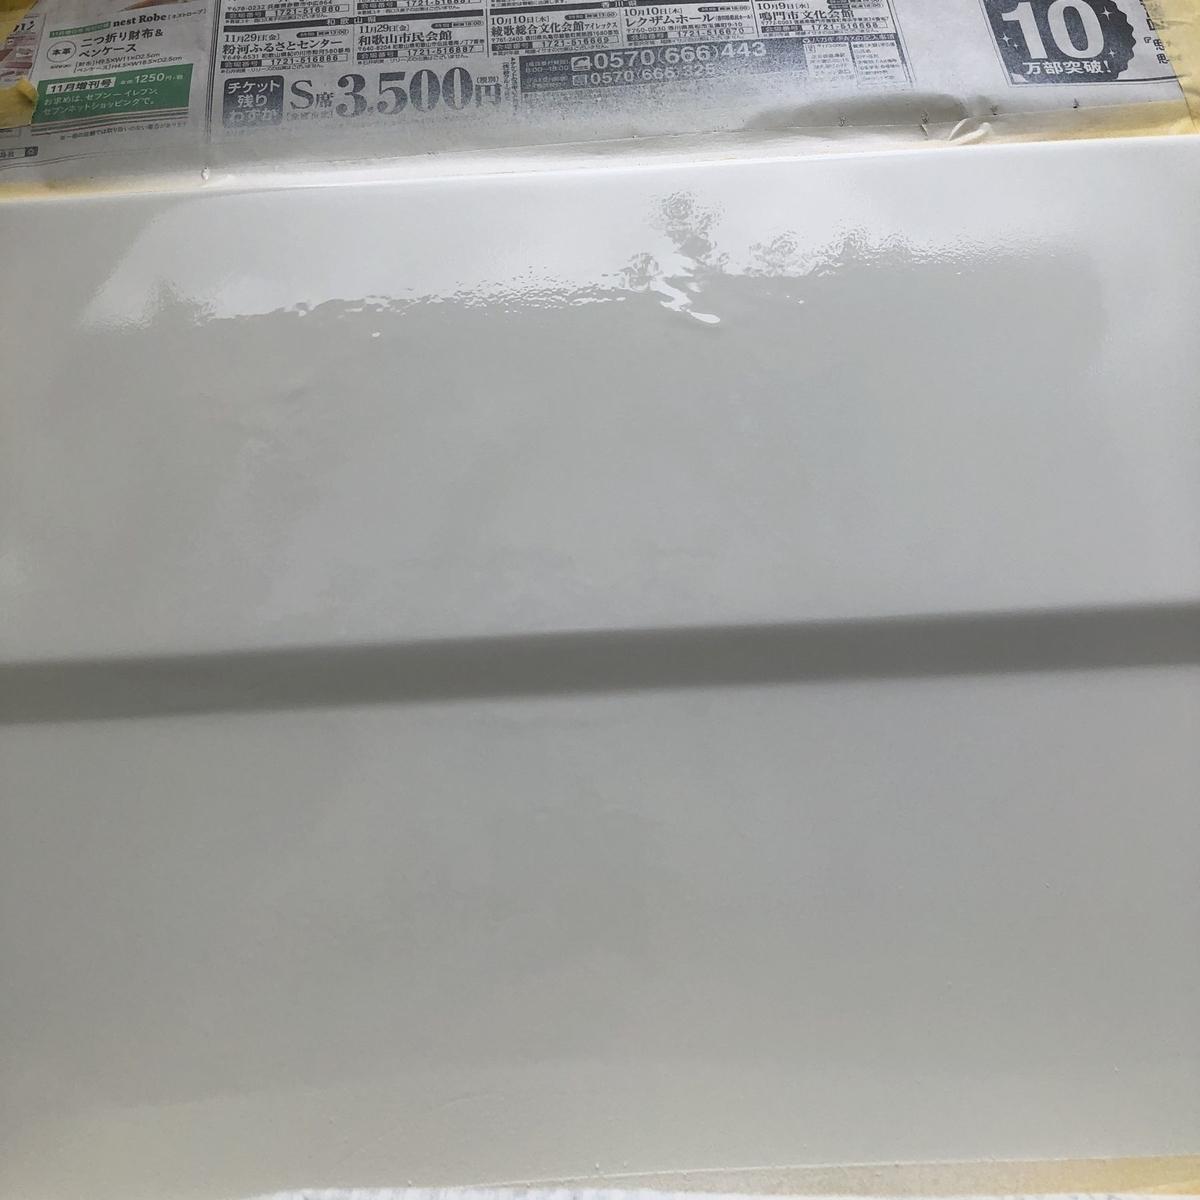 f:id:shiratsume:20201130121555j:plain